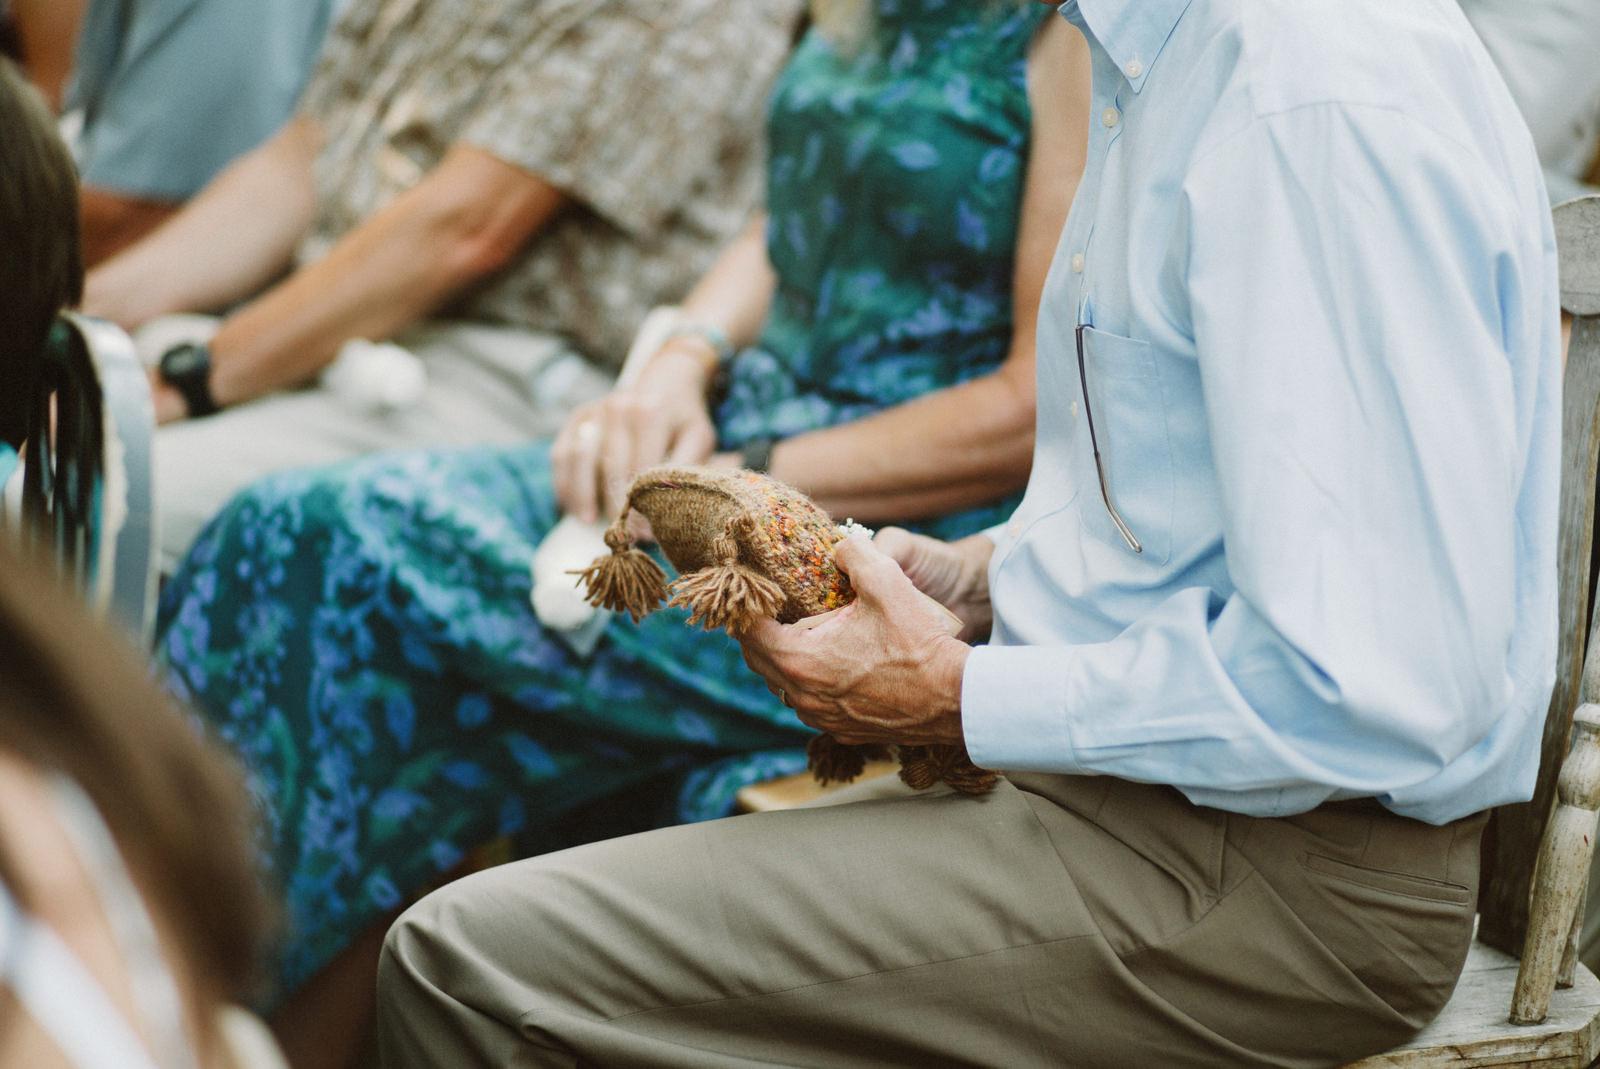 rivers-bend-retreat-wedding-027 RIVER'S BEND RETREAT WEDDING